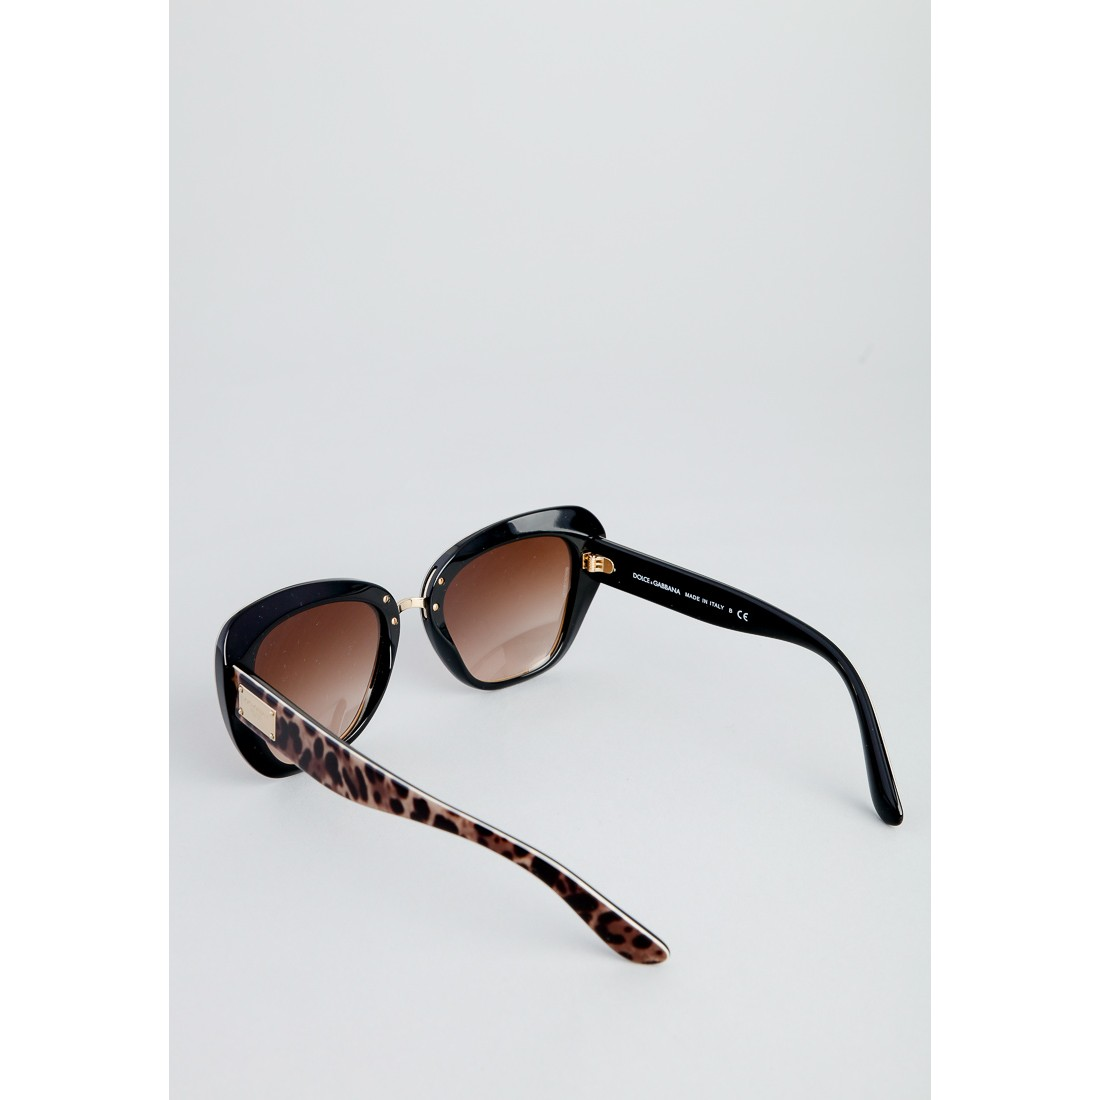 af975895abcf Display Gallery Item 3 · Dolce & Gabbana Leopard Print Cateye Women  Sunglasses DG4296-199513-53-3 Display Gallery Item 4